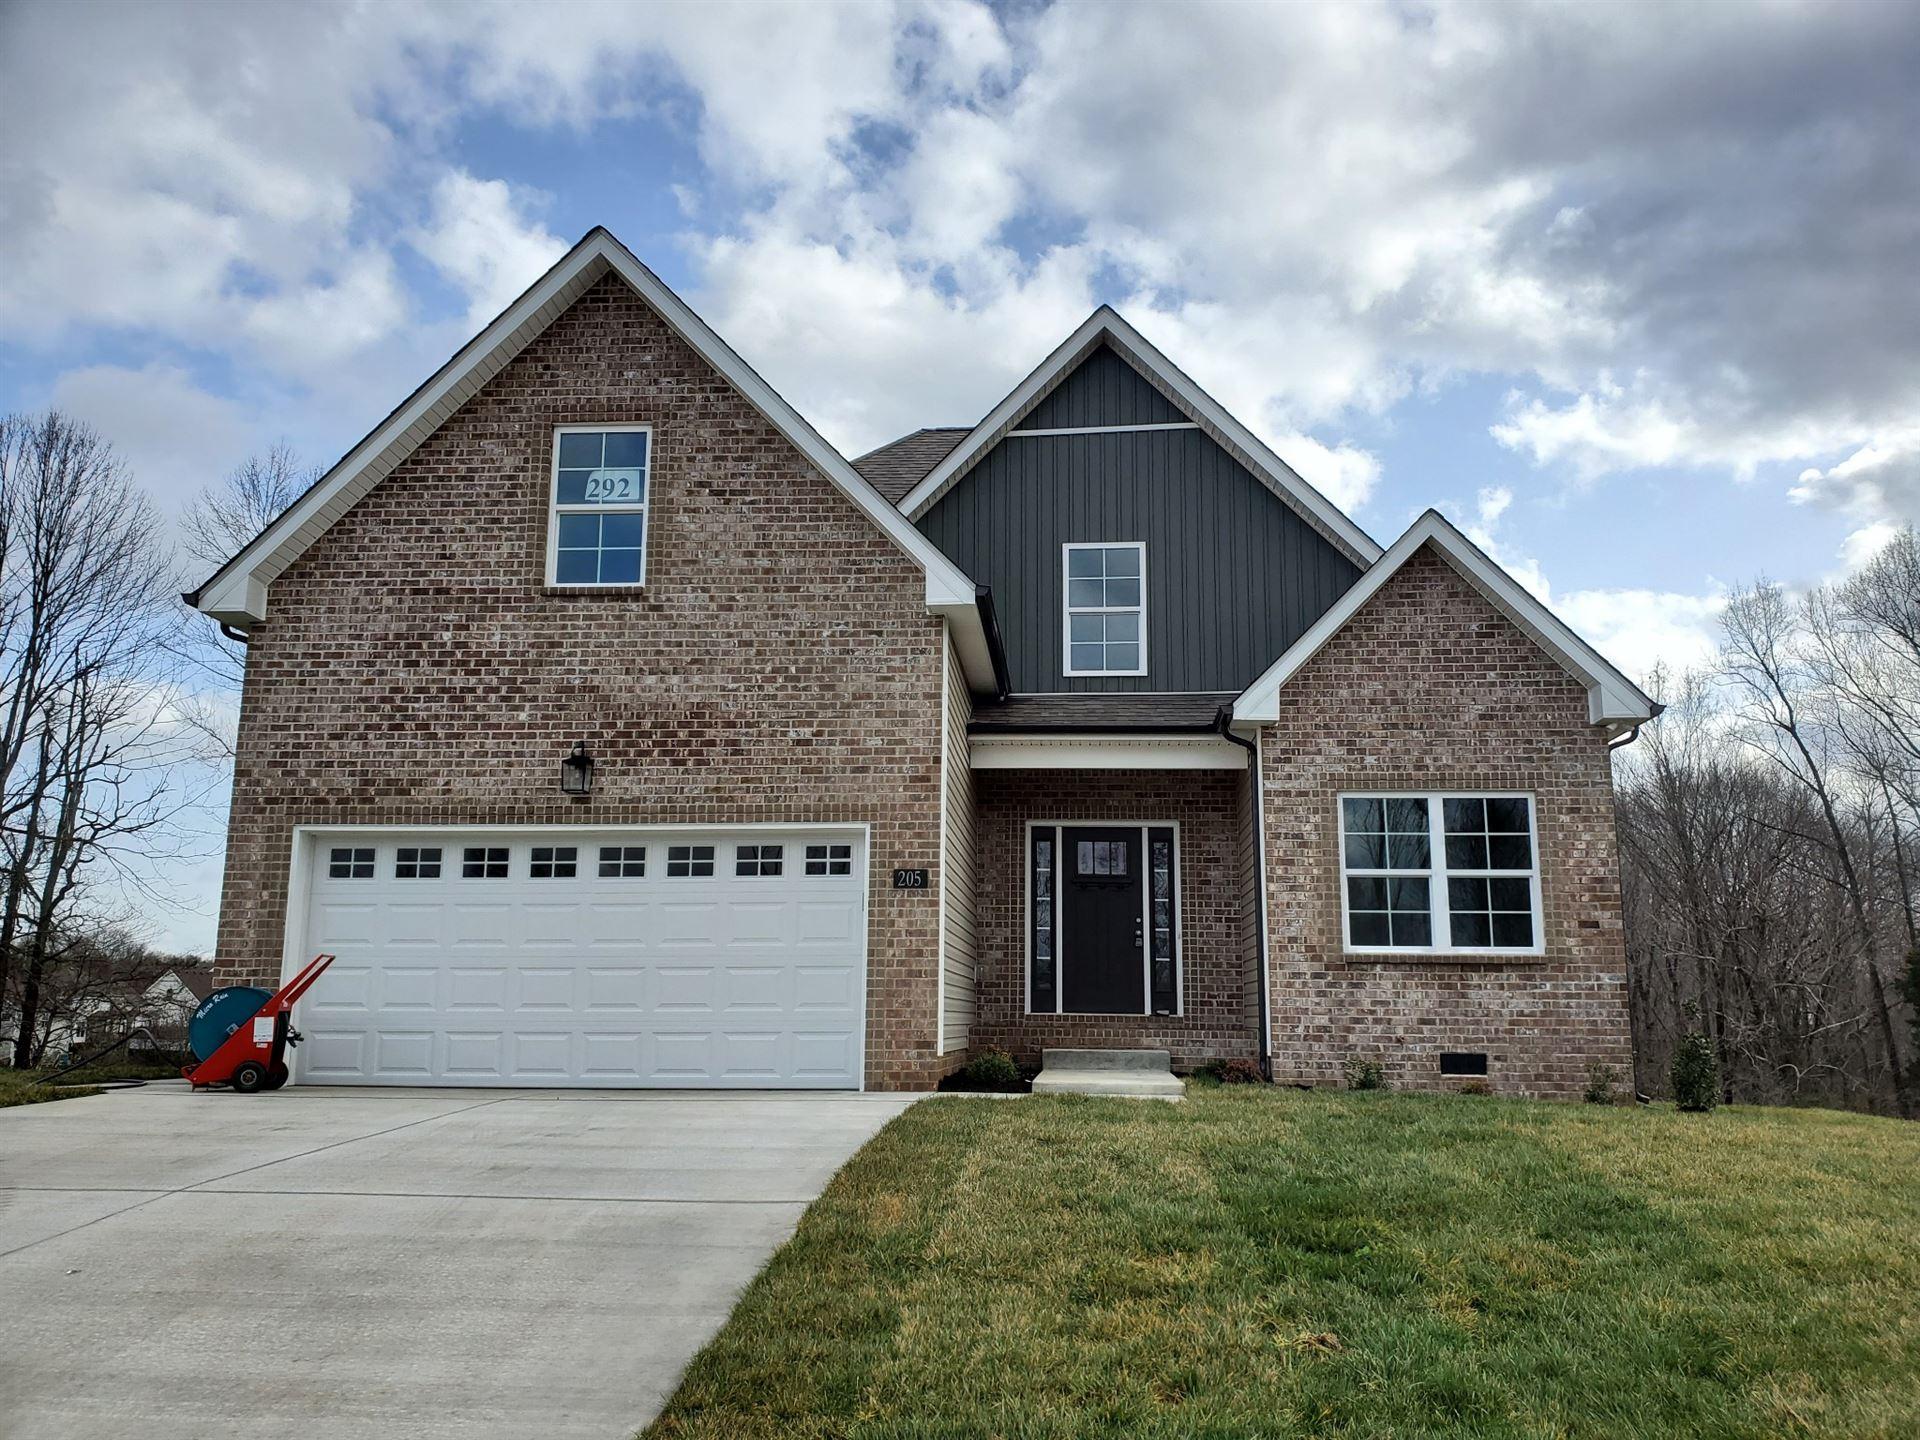 292 Poplar Hill, Clarksville, TN 37043 - MLS#: 2216507